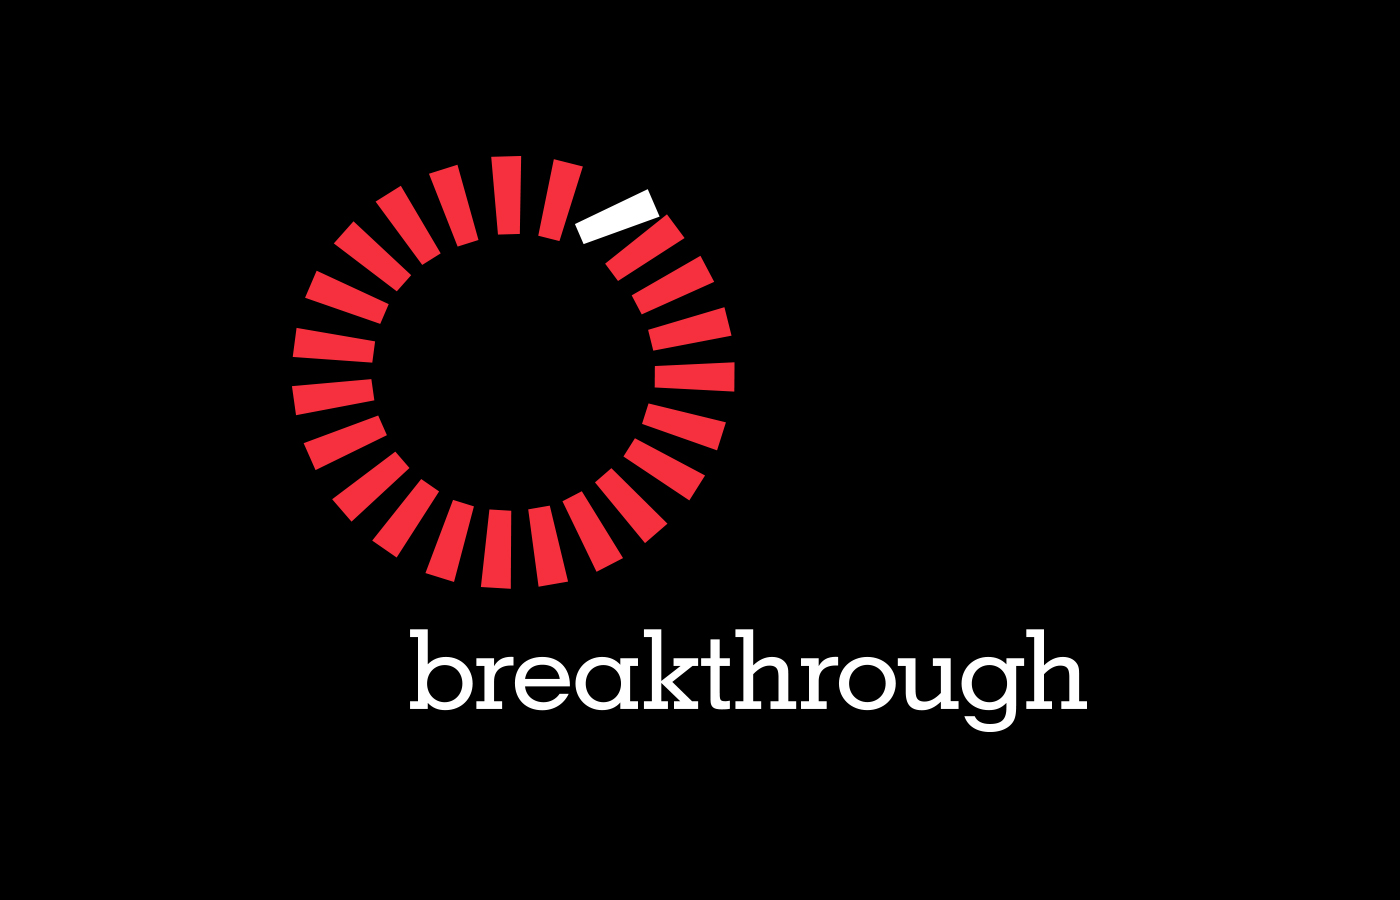 btrakthough_logo_05.jpg